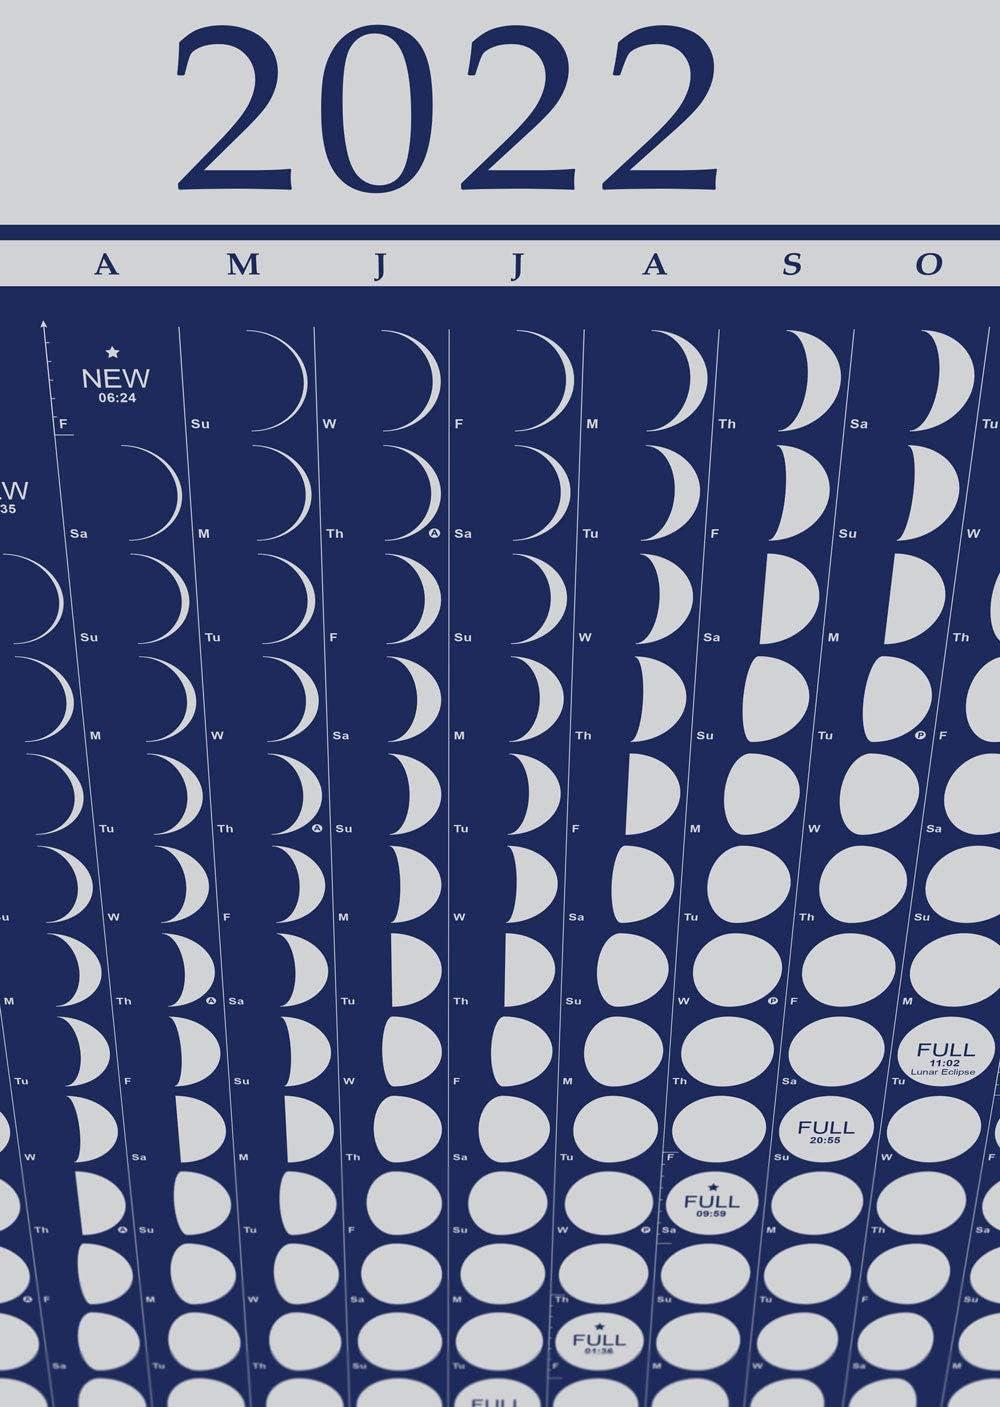 Celestial Calendar 2022.Amazon Com Moon Calendar 2022 Lunar Phases Moonlight Everything Else